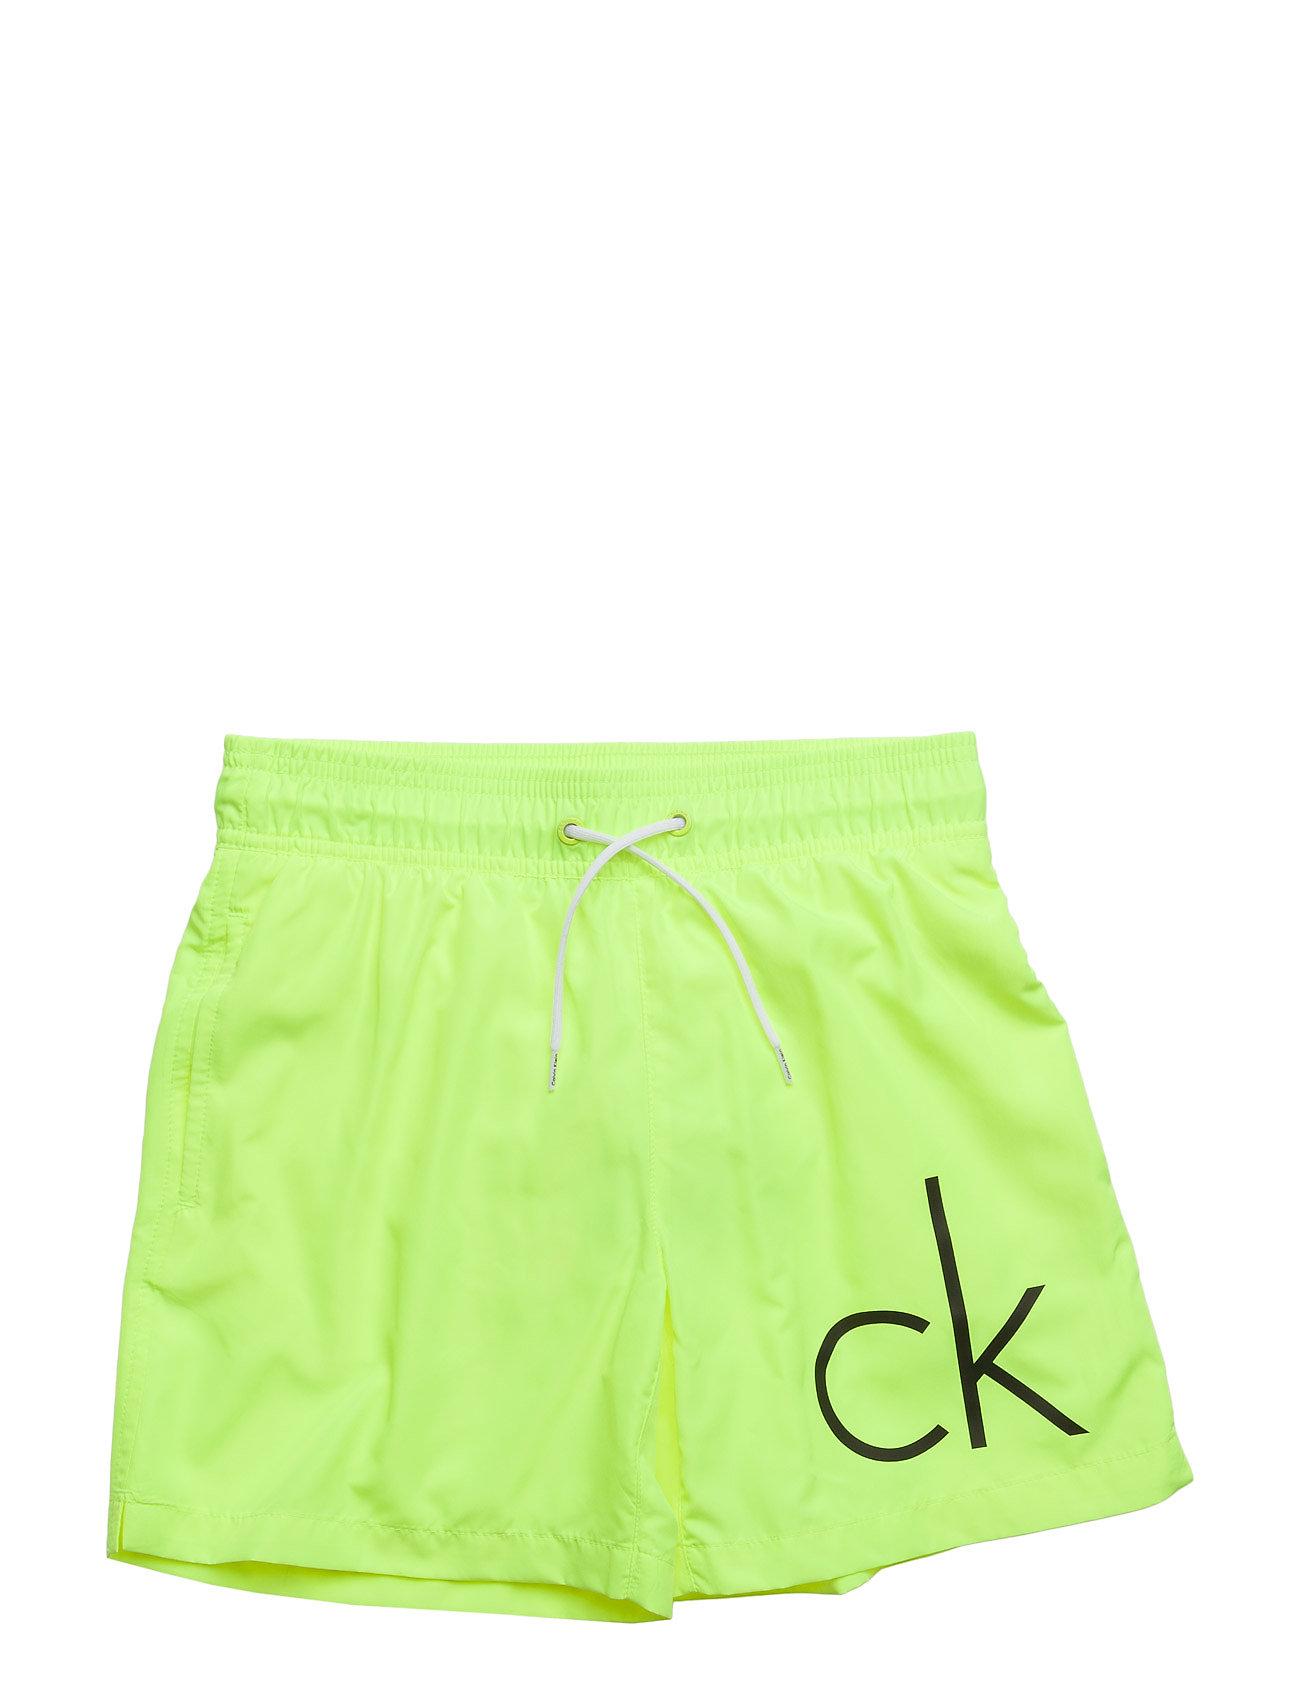 Core Neon  Medium Dr Calvin Klein Badebukser til Børn i